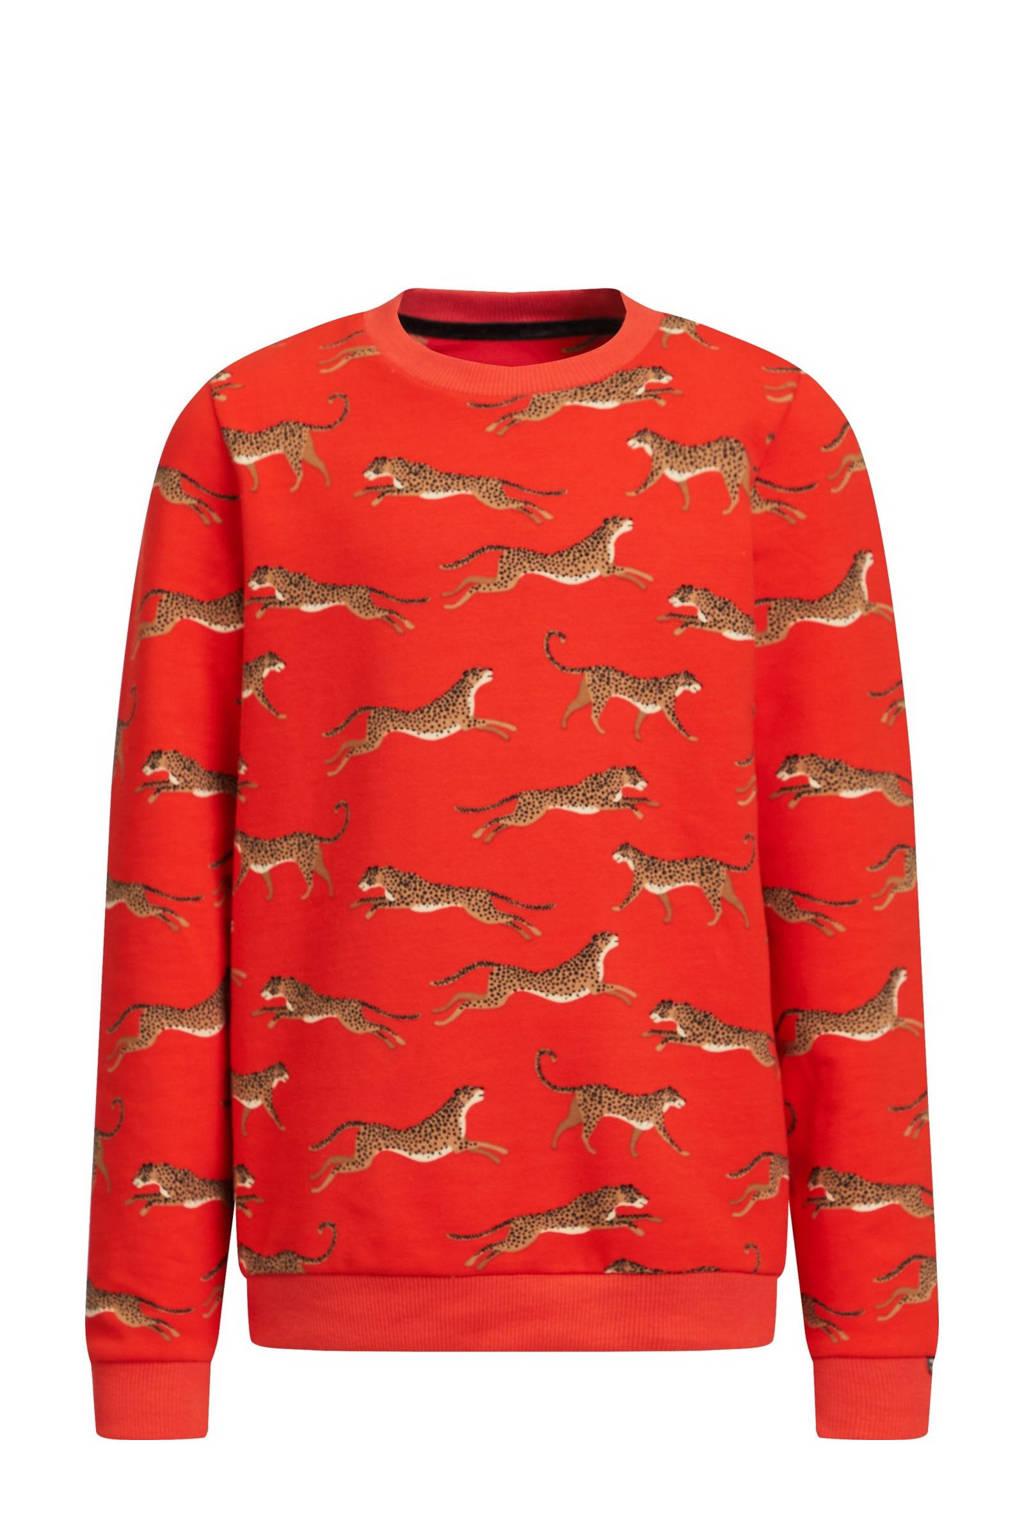 WE Fashion sweater Ginney met all over print oranjerood, Oranjerood